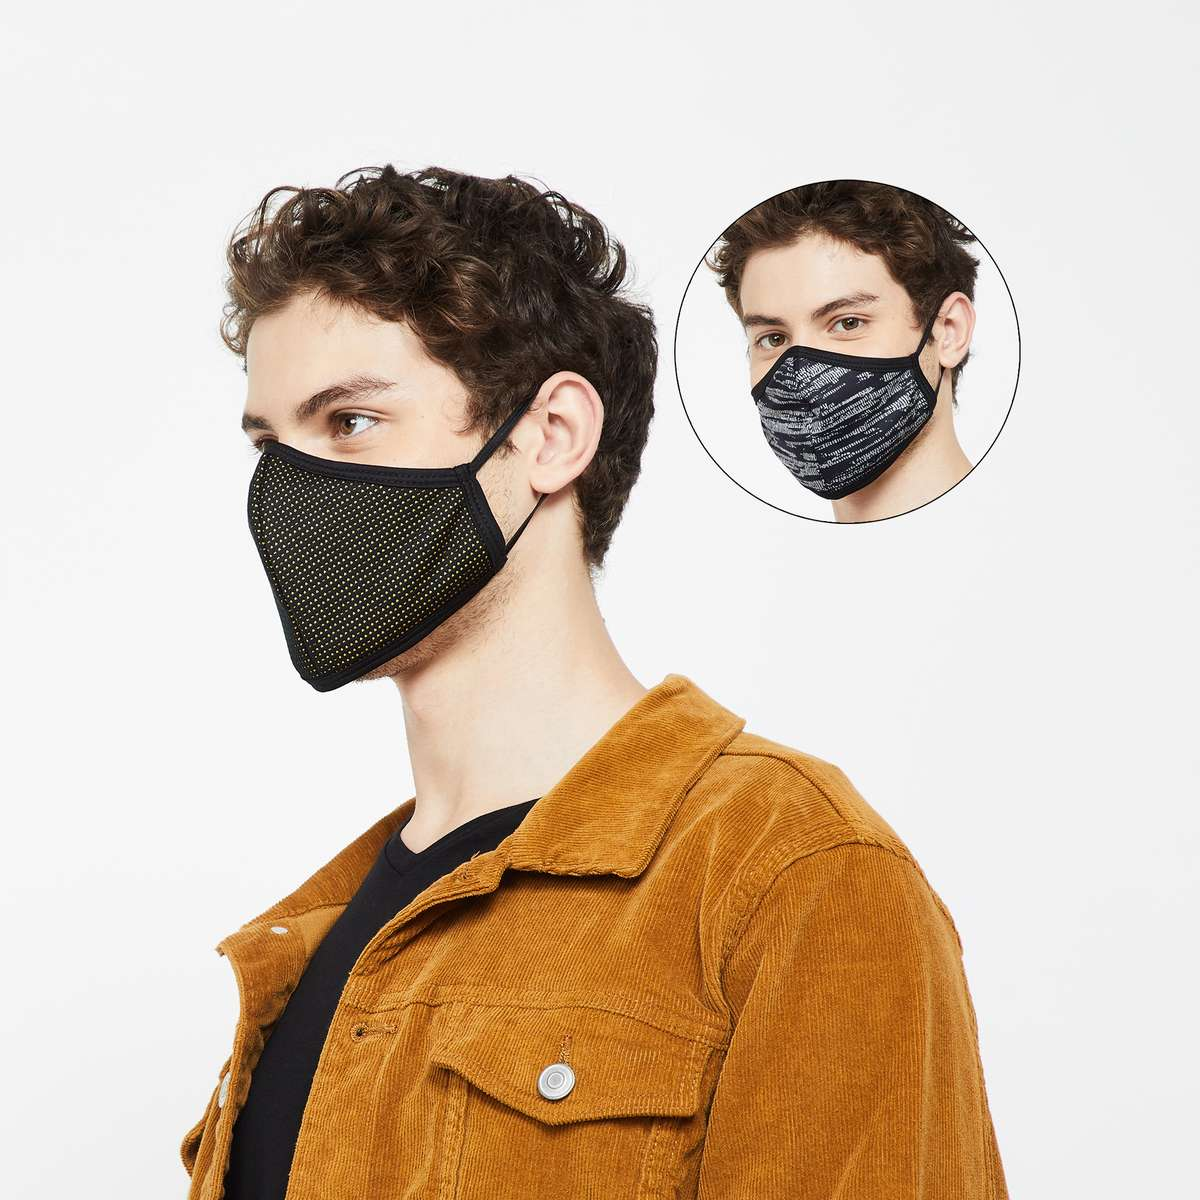 2.FAME FOREVER Men Reusable Masks - Pack of 2